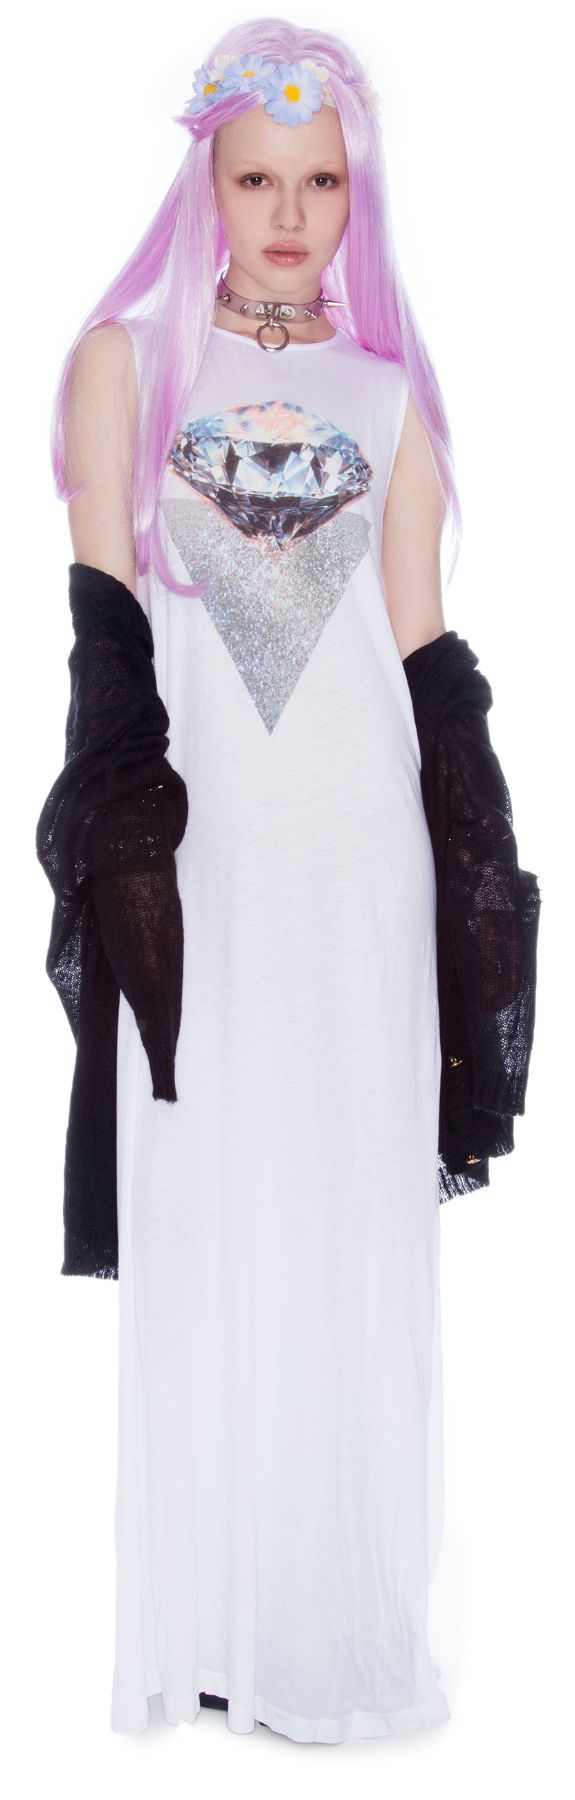 Wildfox Diamond Spell Antoinette Dress